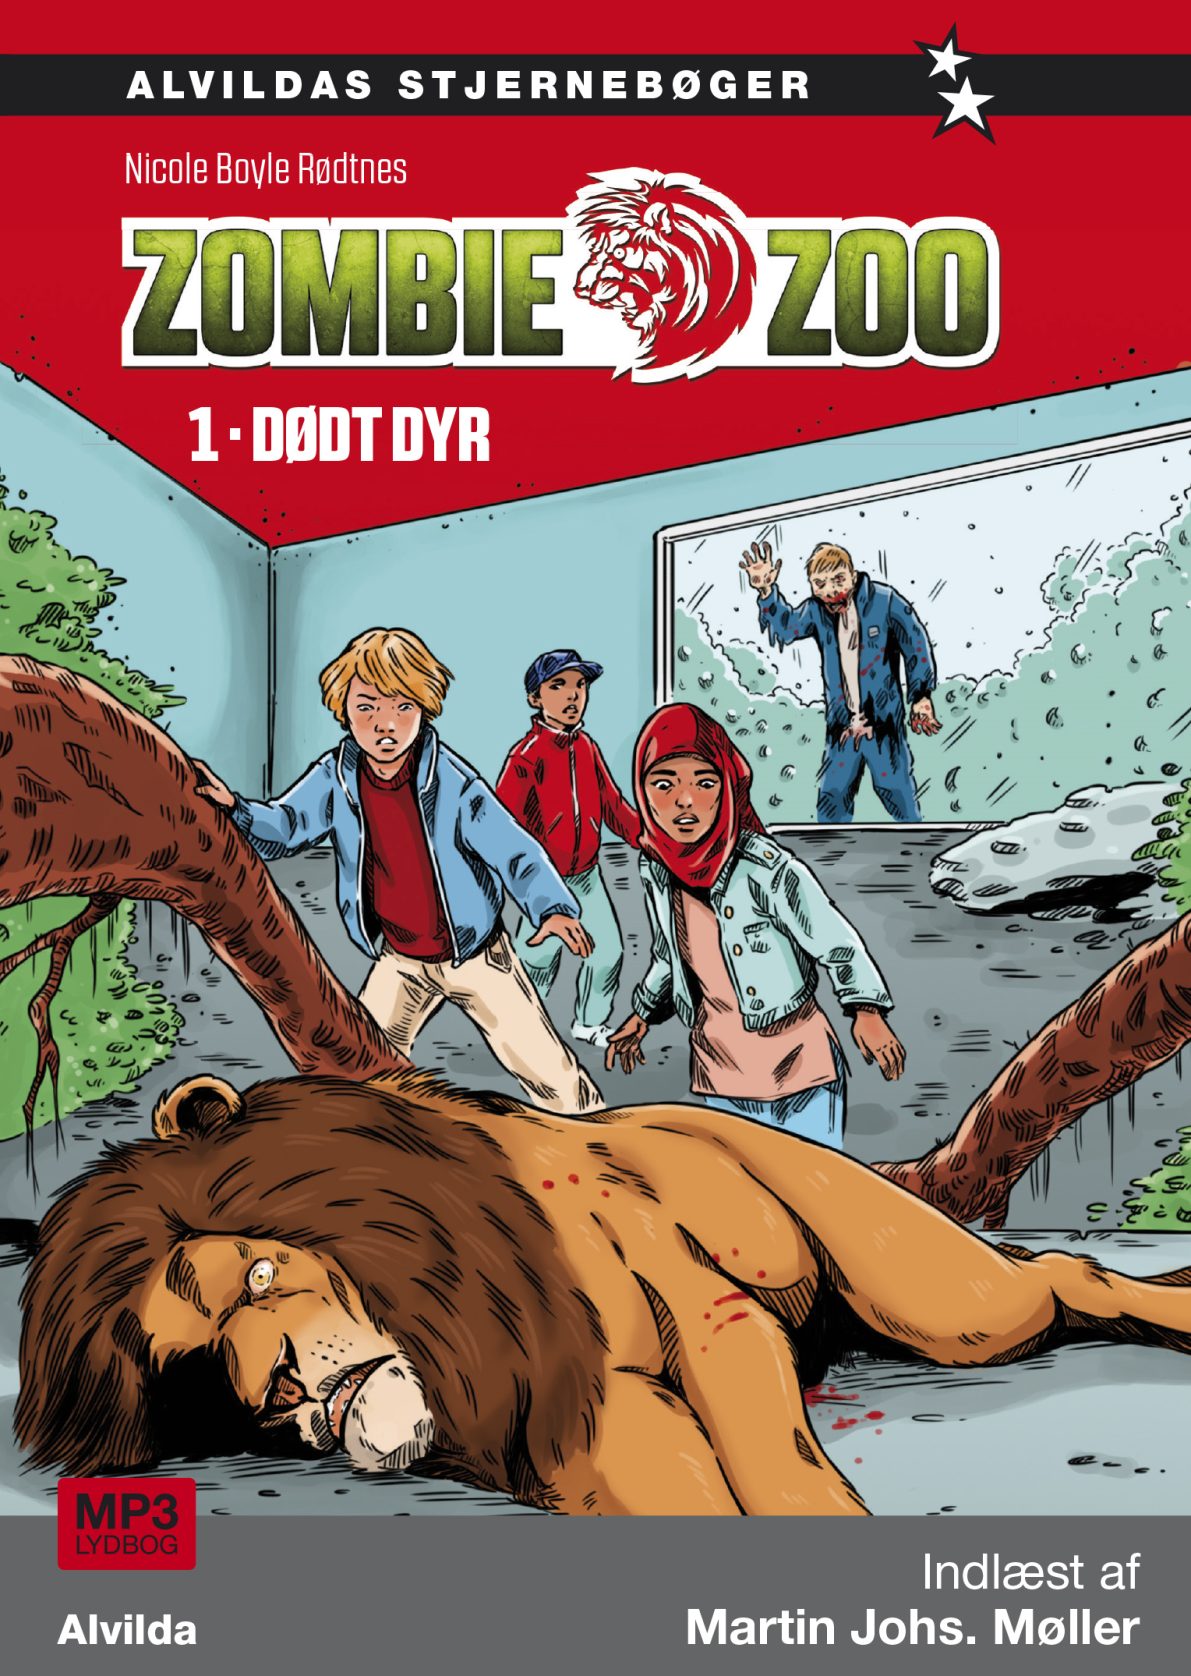 Zombie zoo #1: Dødt dyr - Maneno - 10956